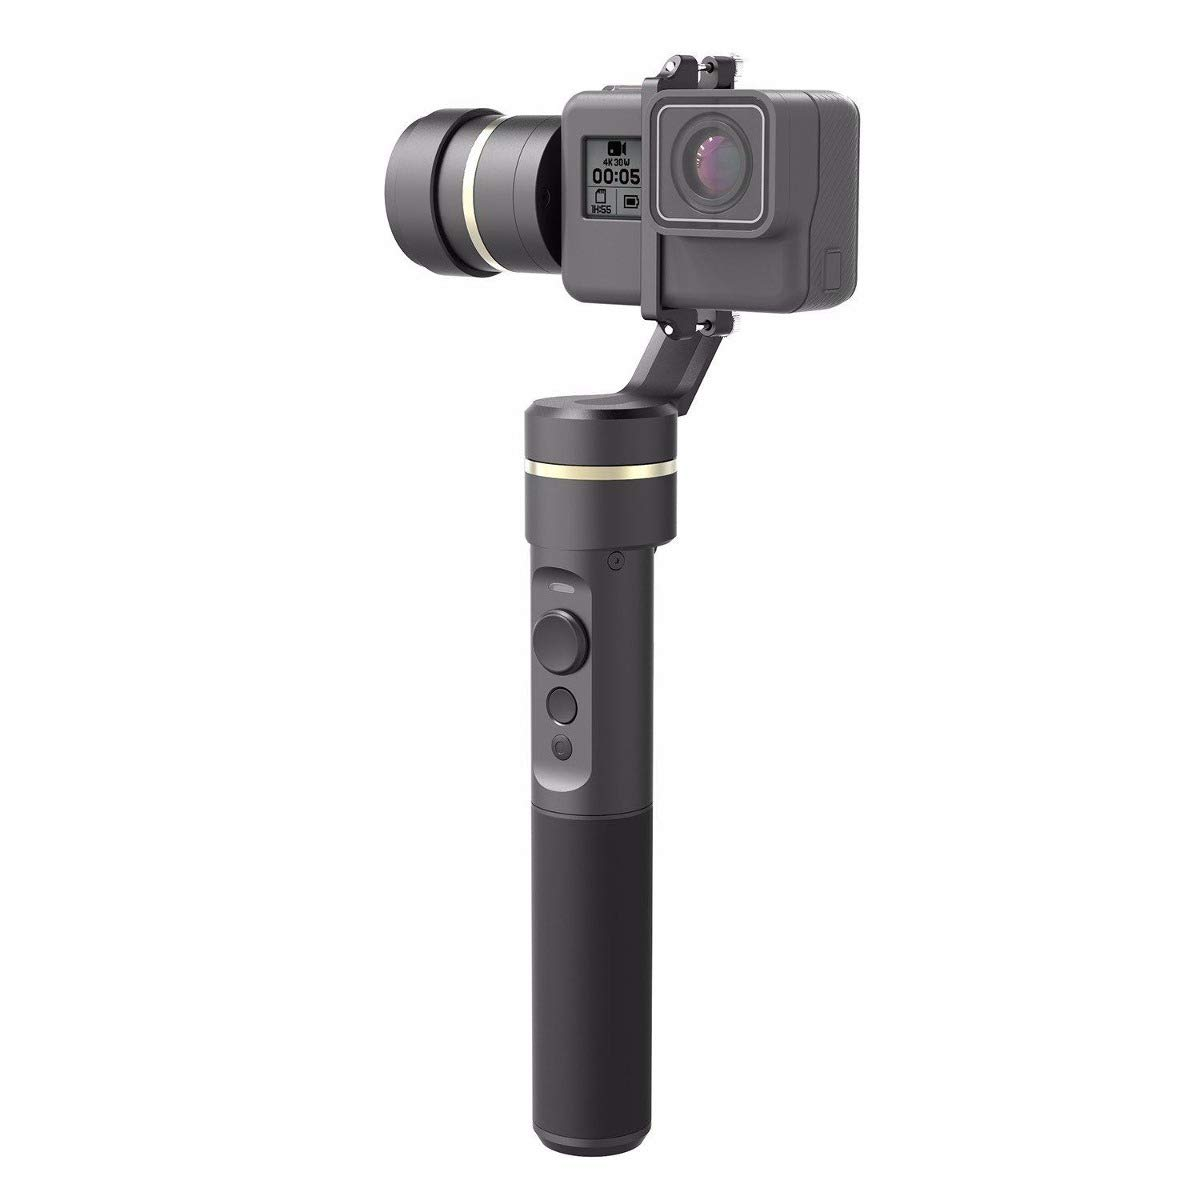 FeiyuTech G5 3 Axis Handheld Gimbal for GoPro Hero (Black)